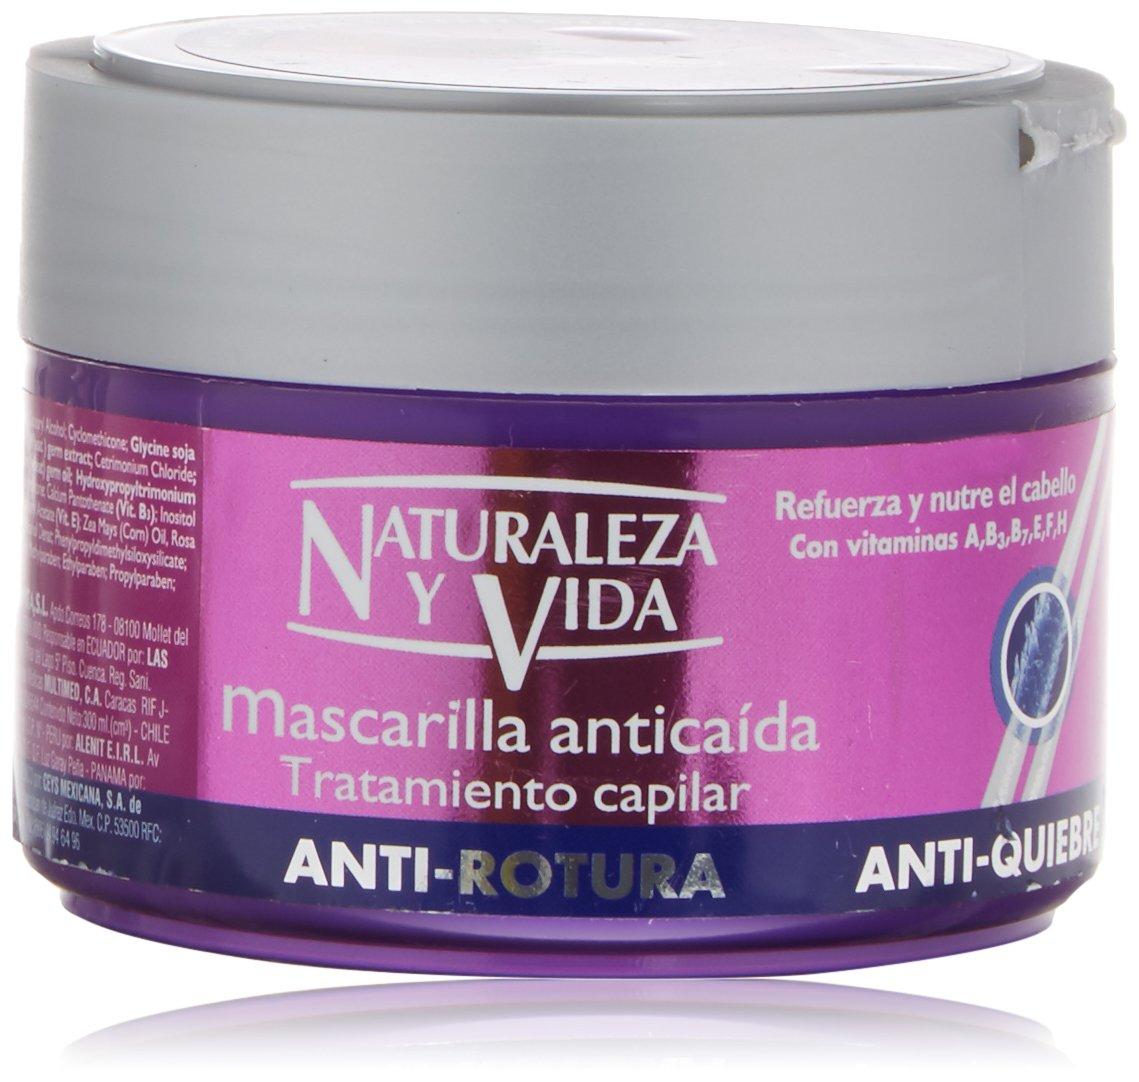 MASCARILLA ANTICAÍDA tratamiento capilar antirotura 300 ml: Amazon.es: Belleza